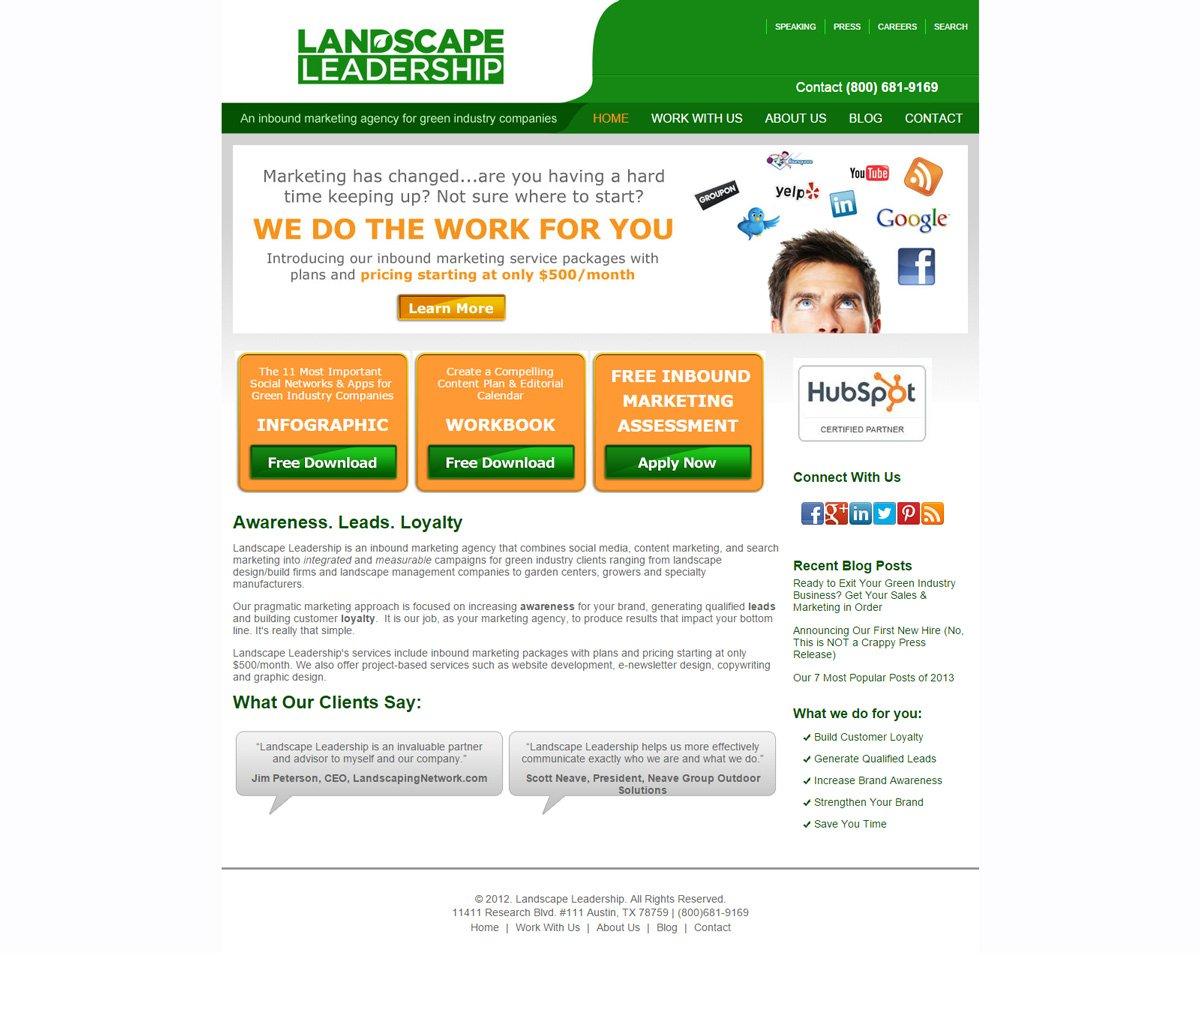 landscape-leadership-original